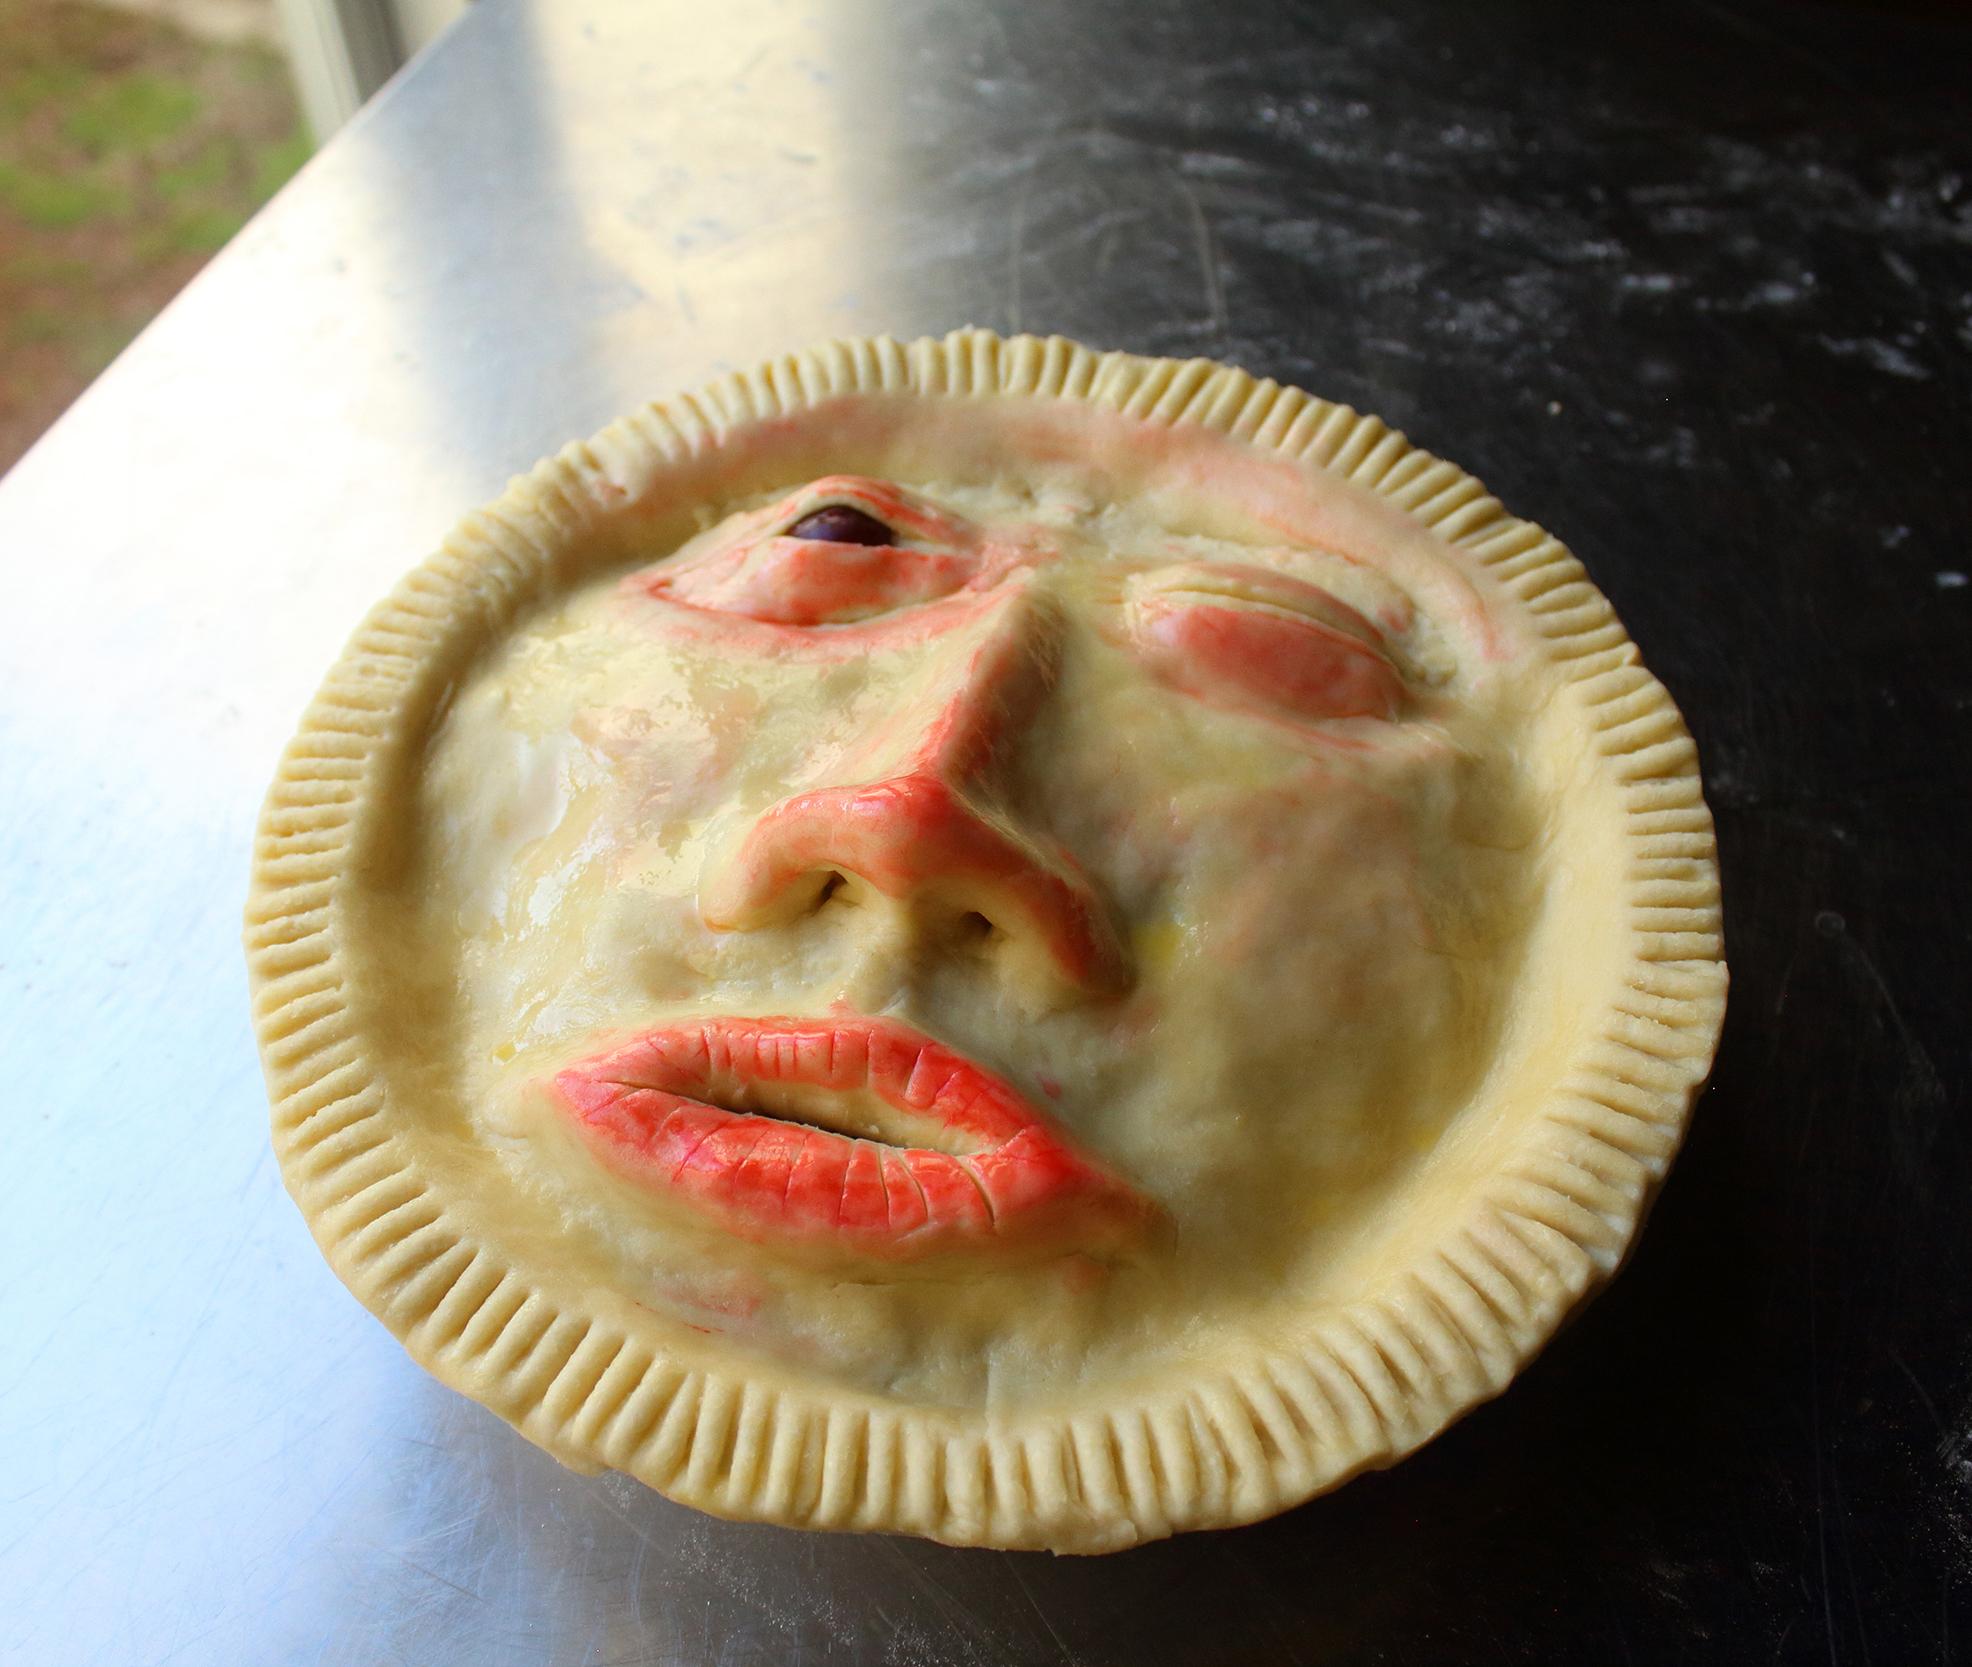 Chef John's Face Pie Chef John